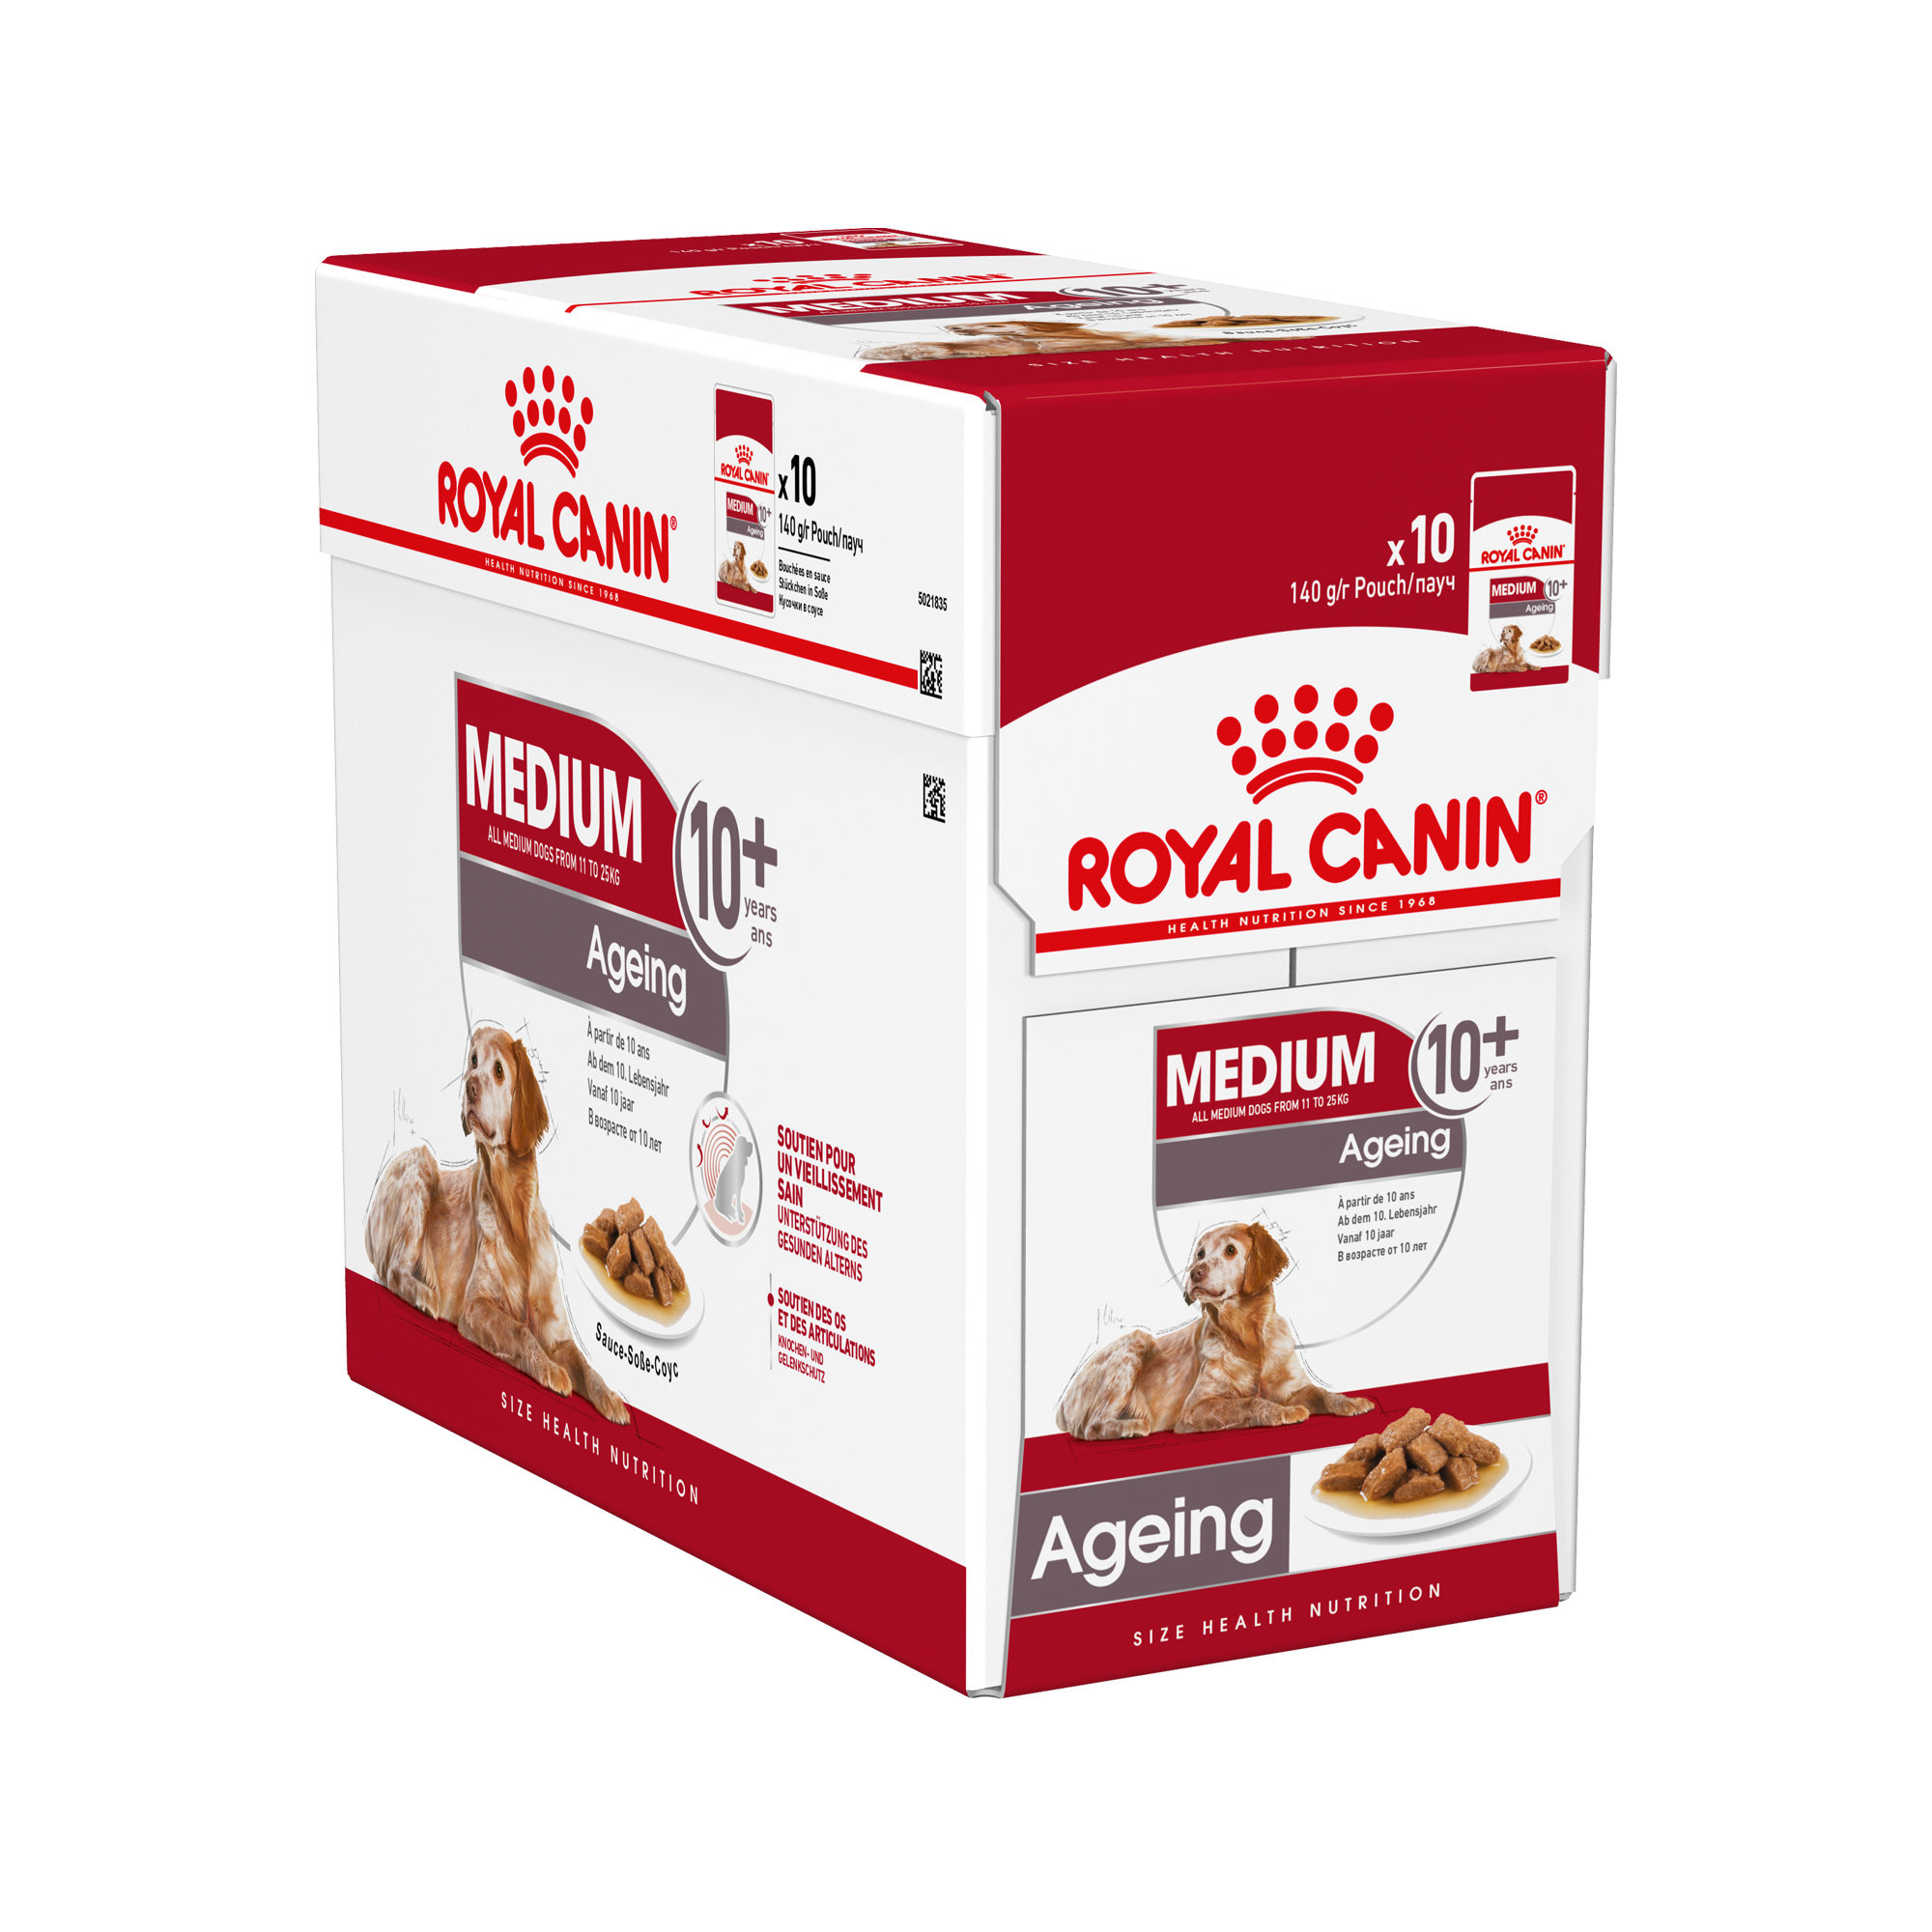 Royal Canin Medium Ageing 10+ Hundefutter - Frischebeutel